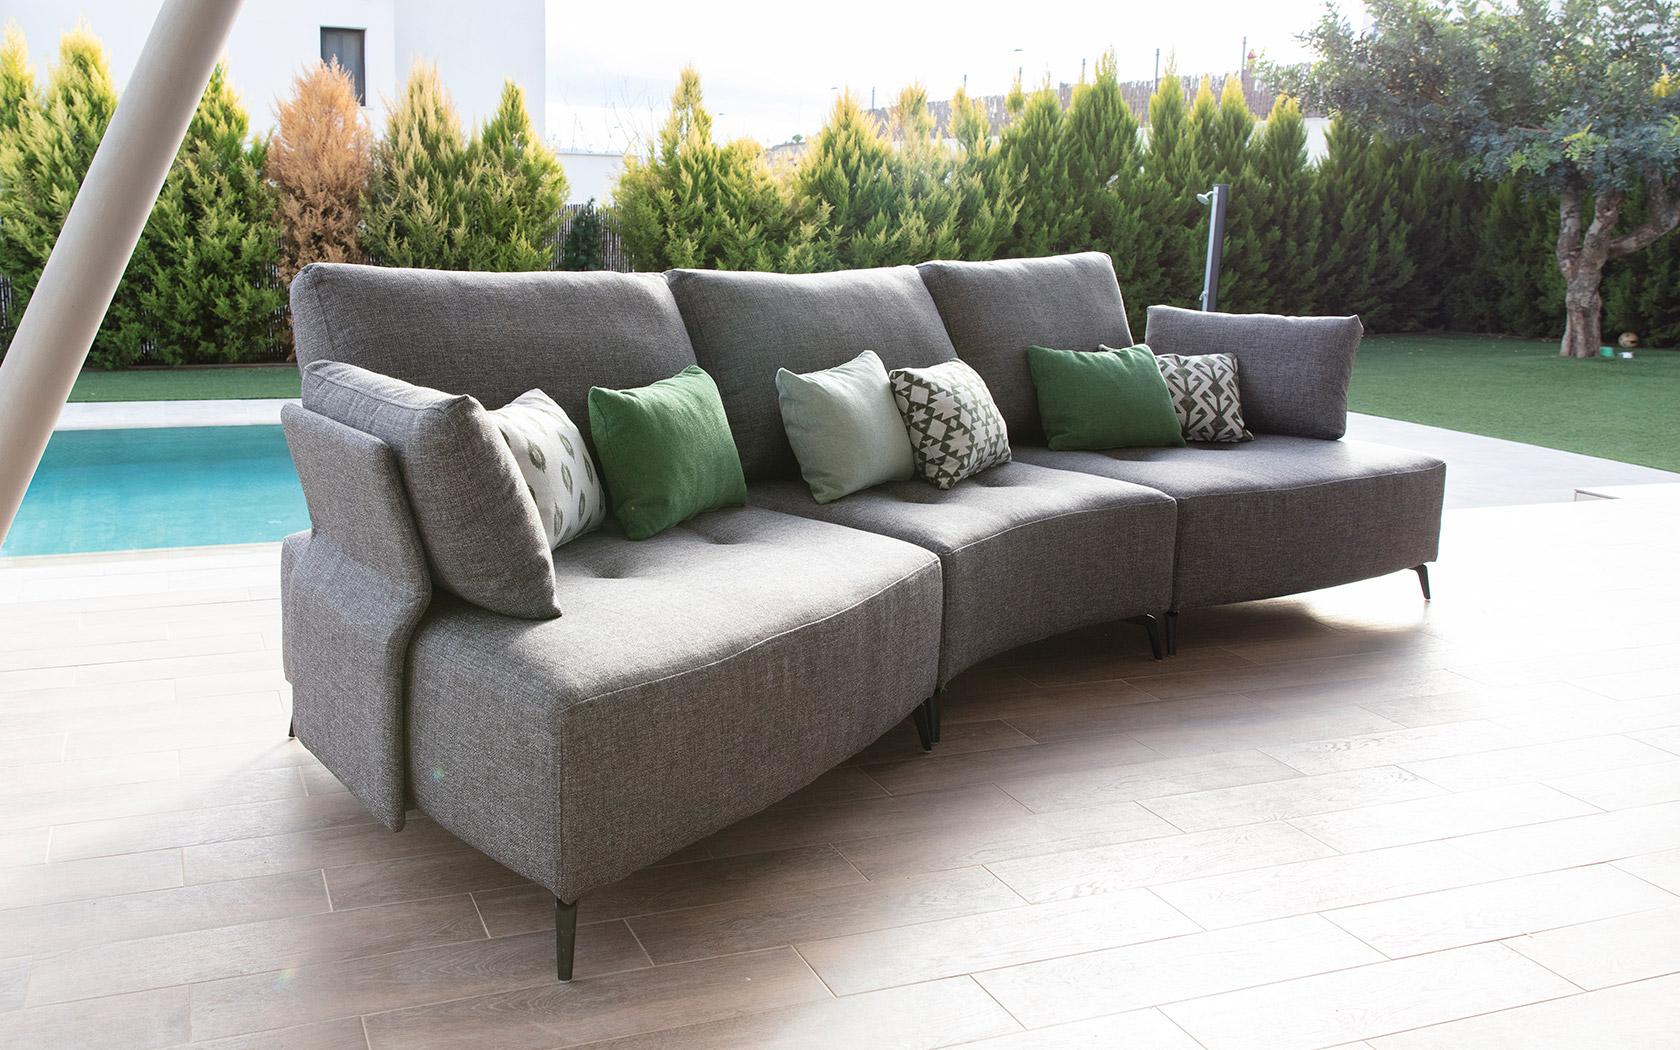 kalahari sofa 2021 05